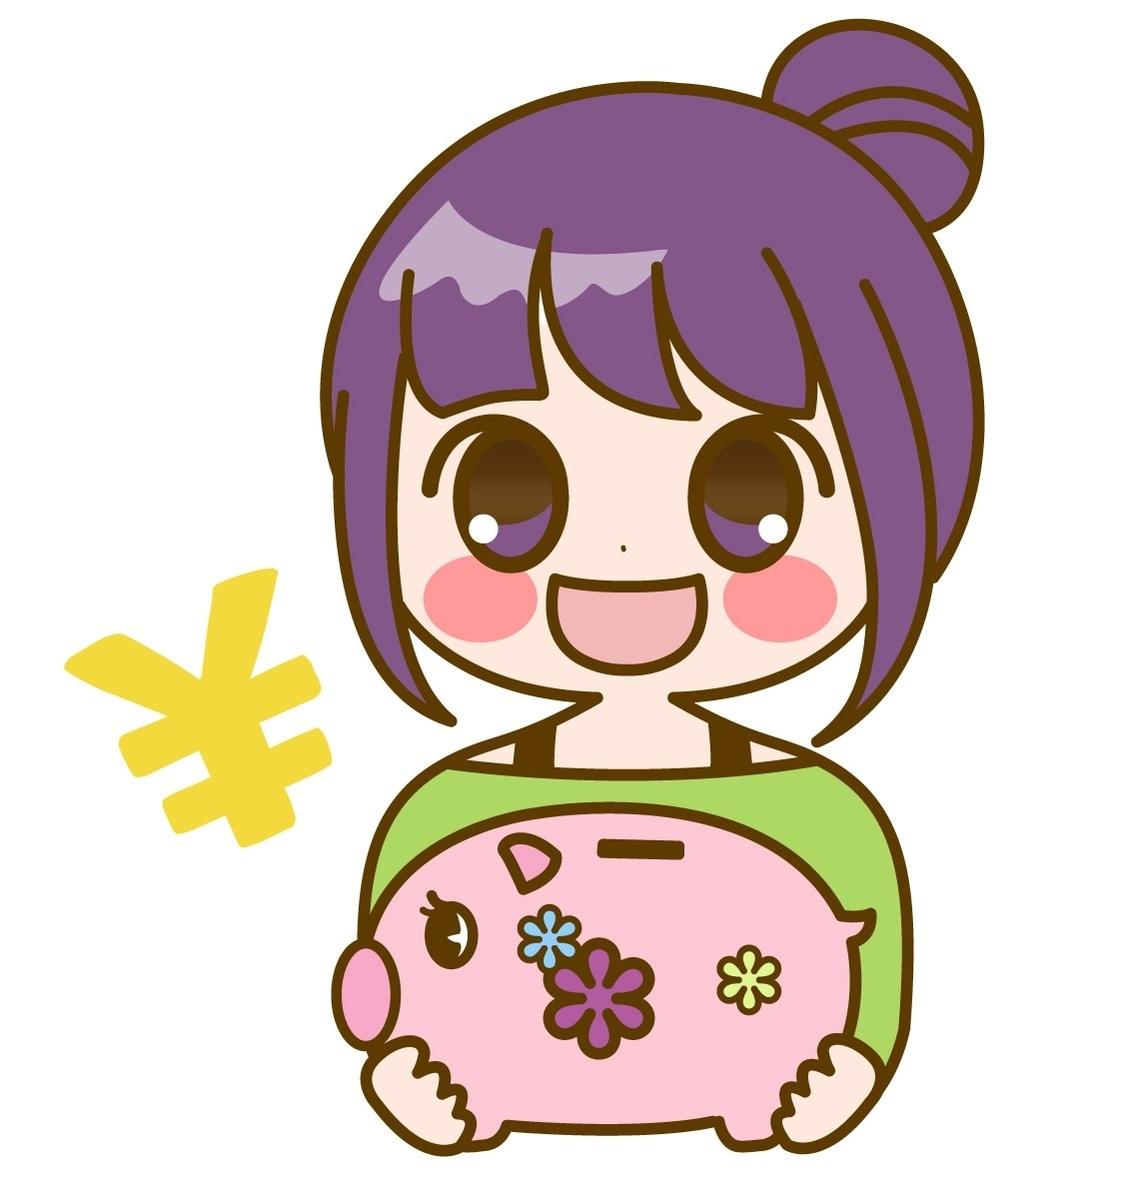 f:id:mikotomikaka:20200421222251j:plain